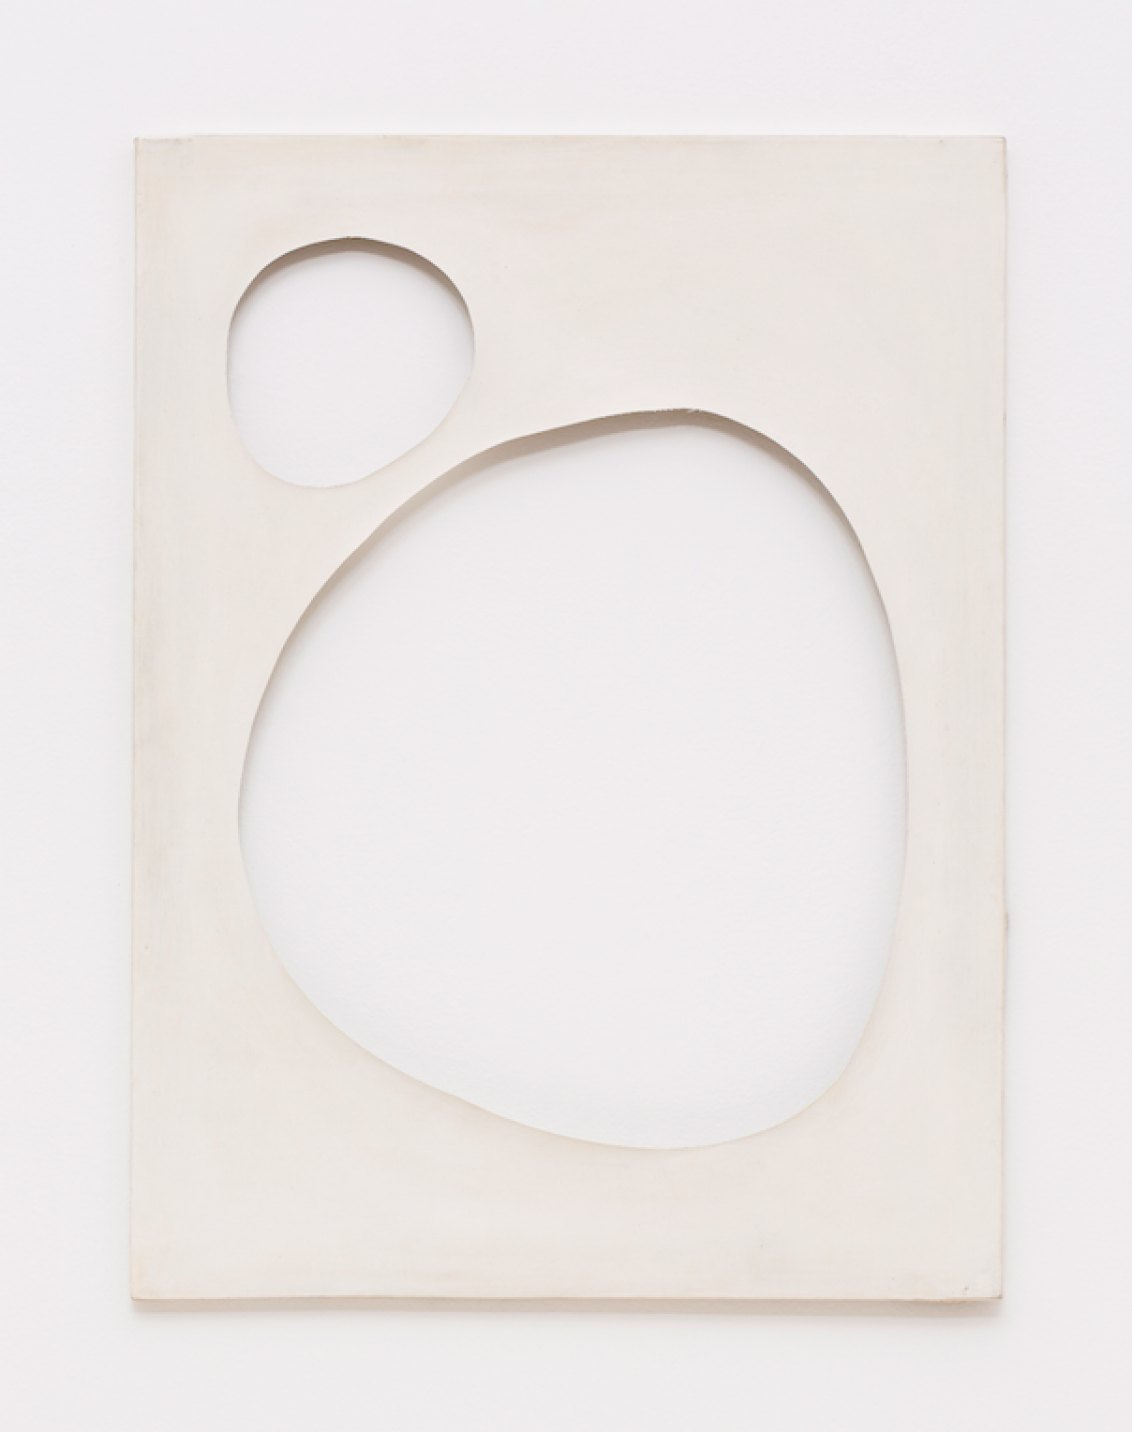 Dadamaino,<em>untitled, fromVolumiseries</em>,1959,water-based ink on canvas, 60 ×50 cm - Mendes Wood DM